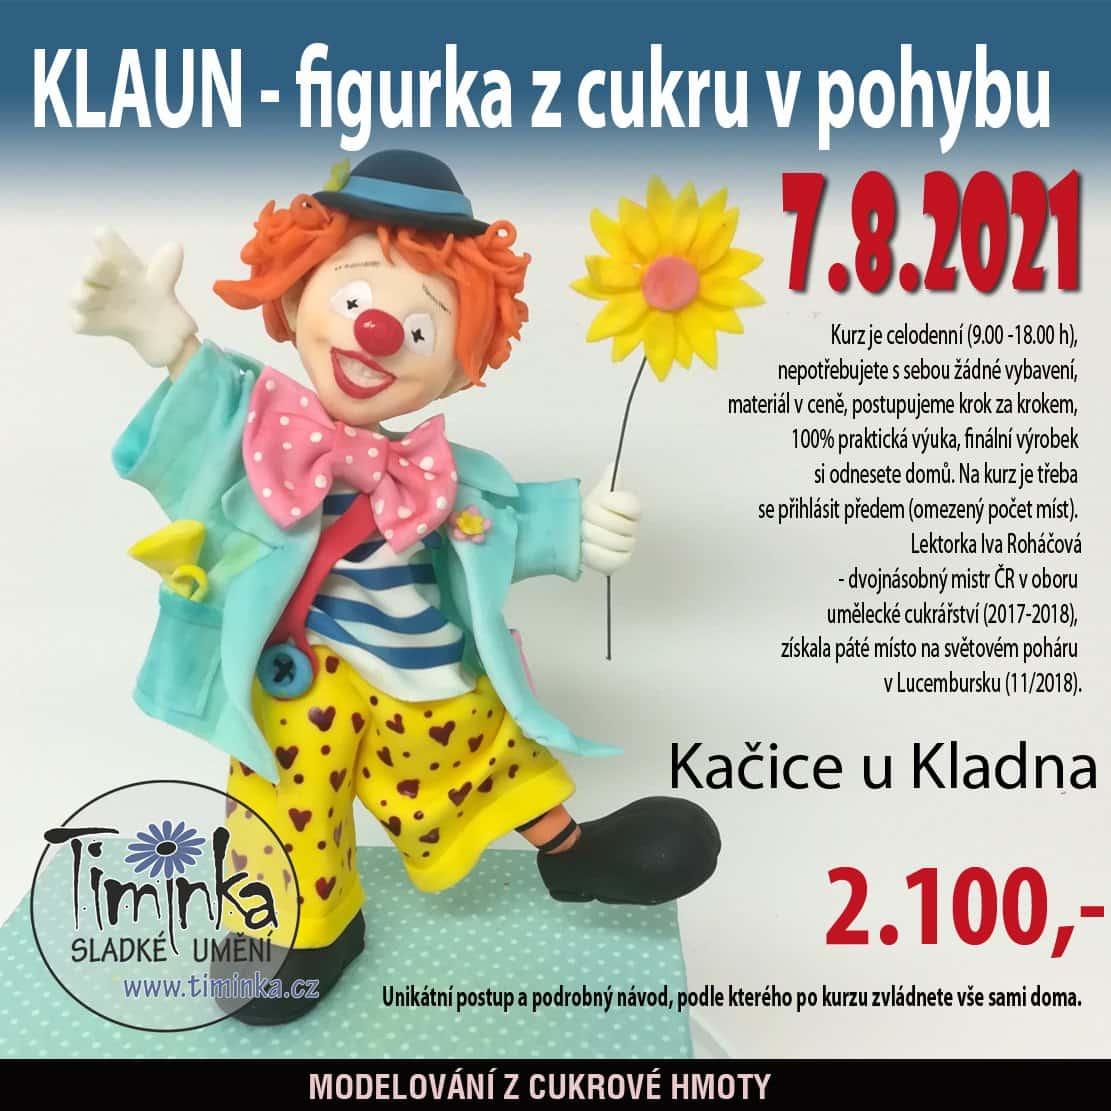 images/kurzy/klaun0708.jpg